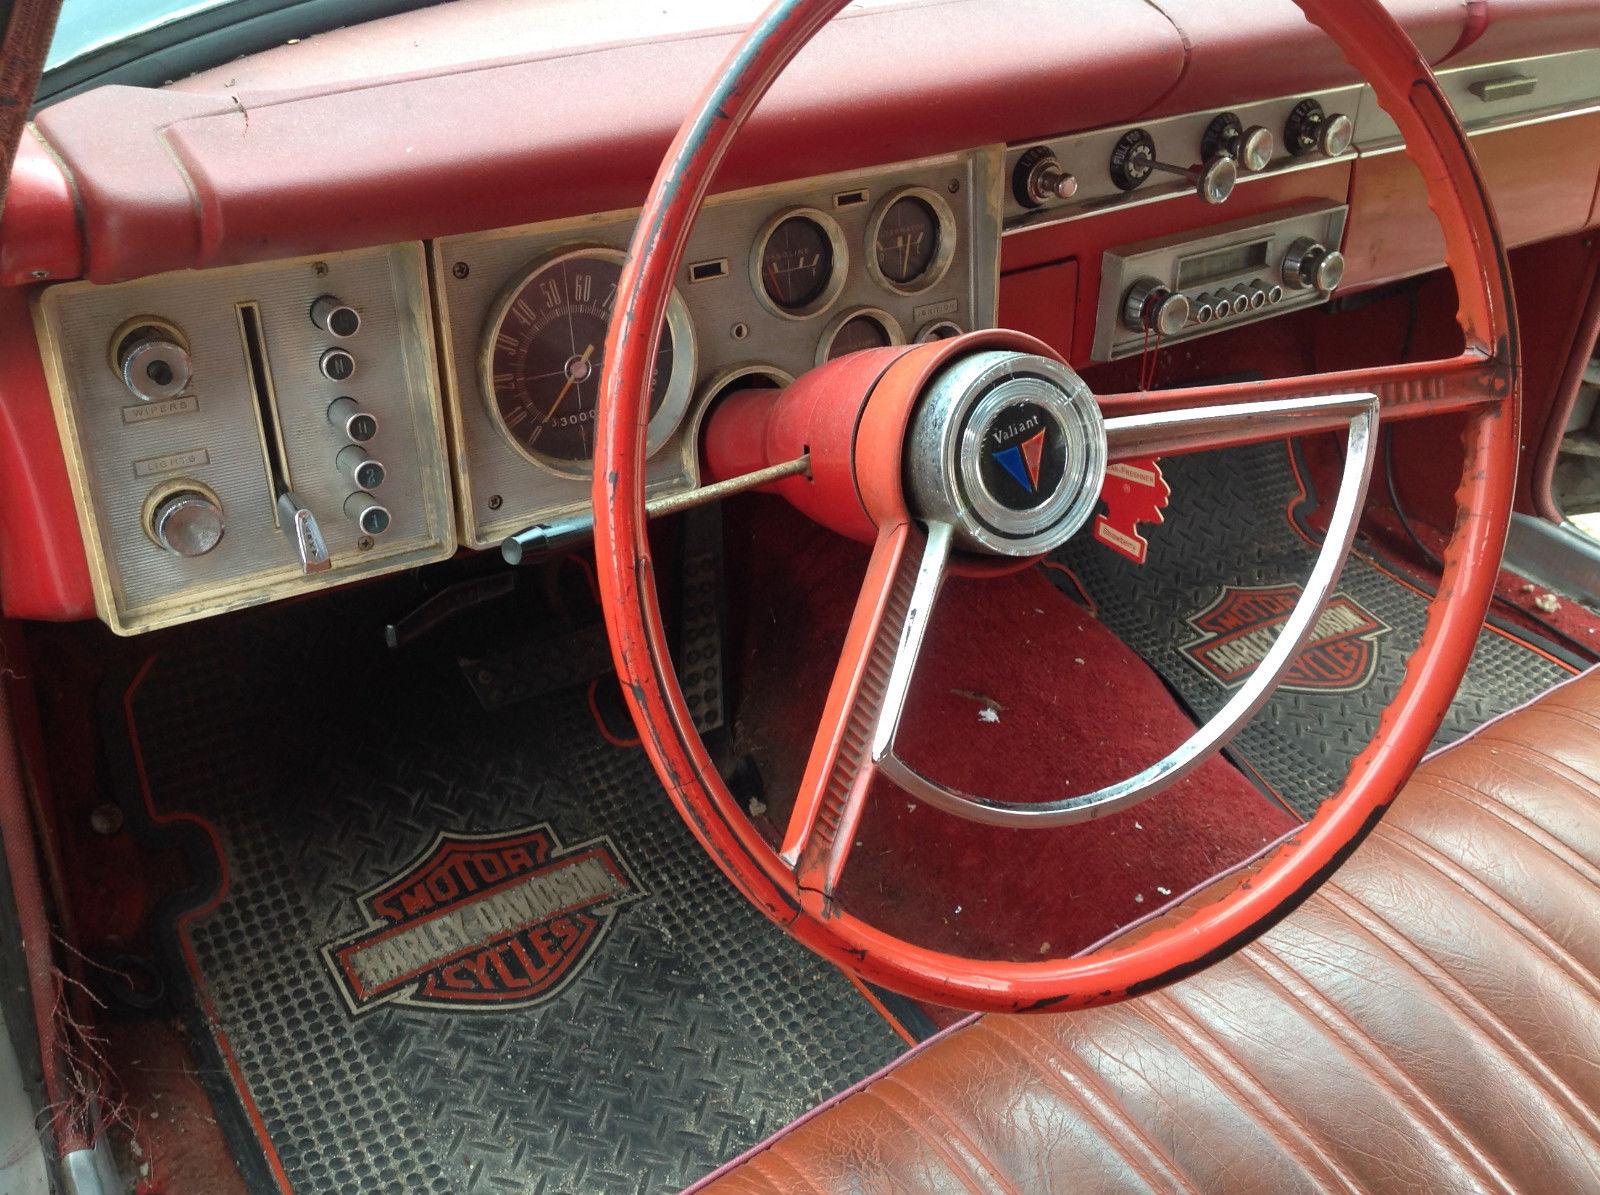 1964 Plymouth Valiant 200 3 7L runs great, no body rust, push button